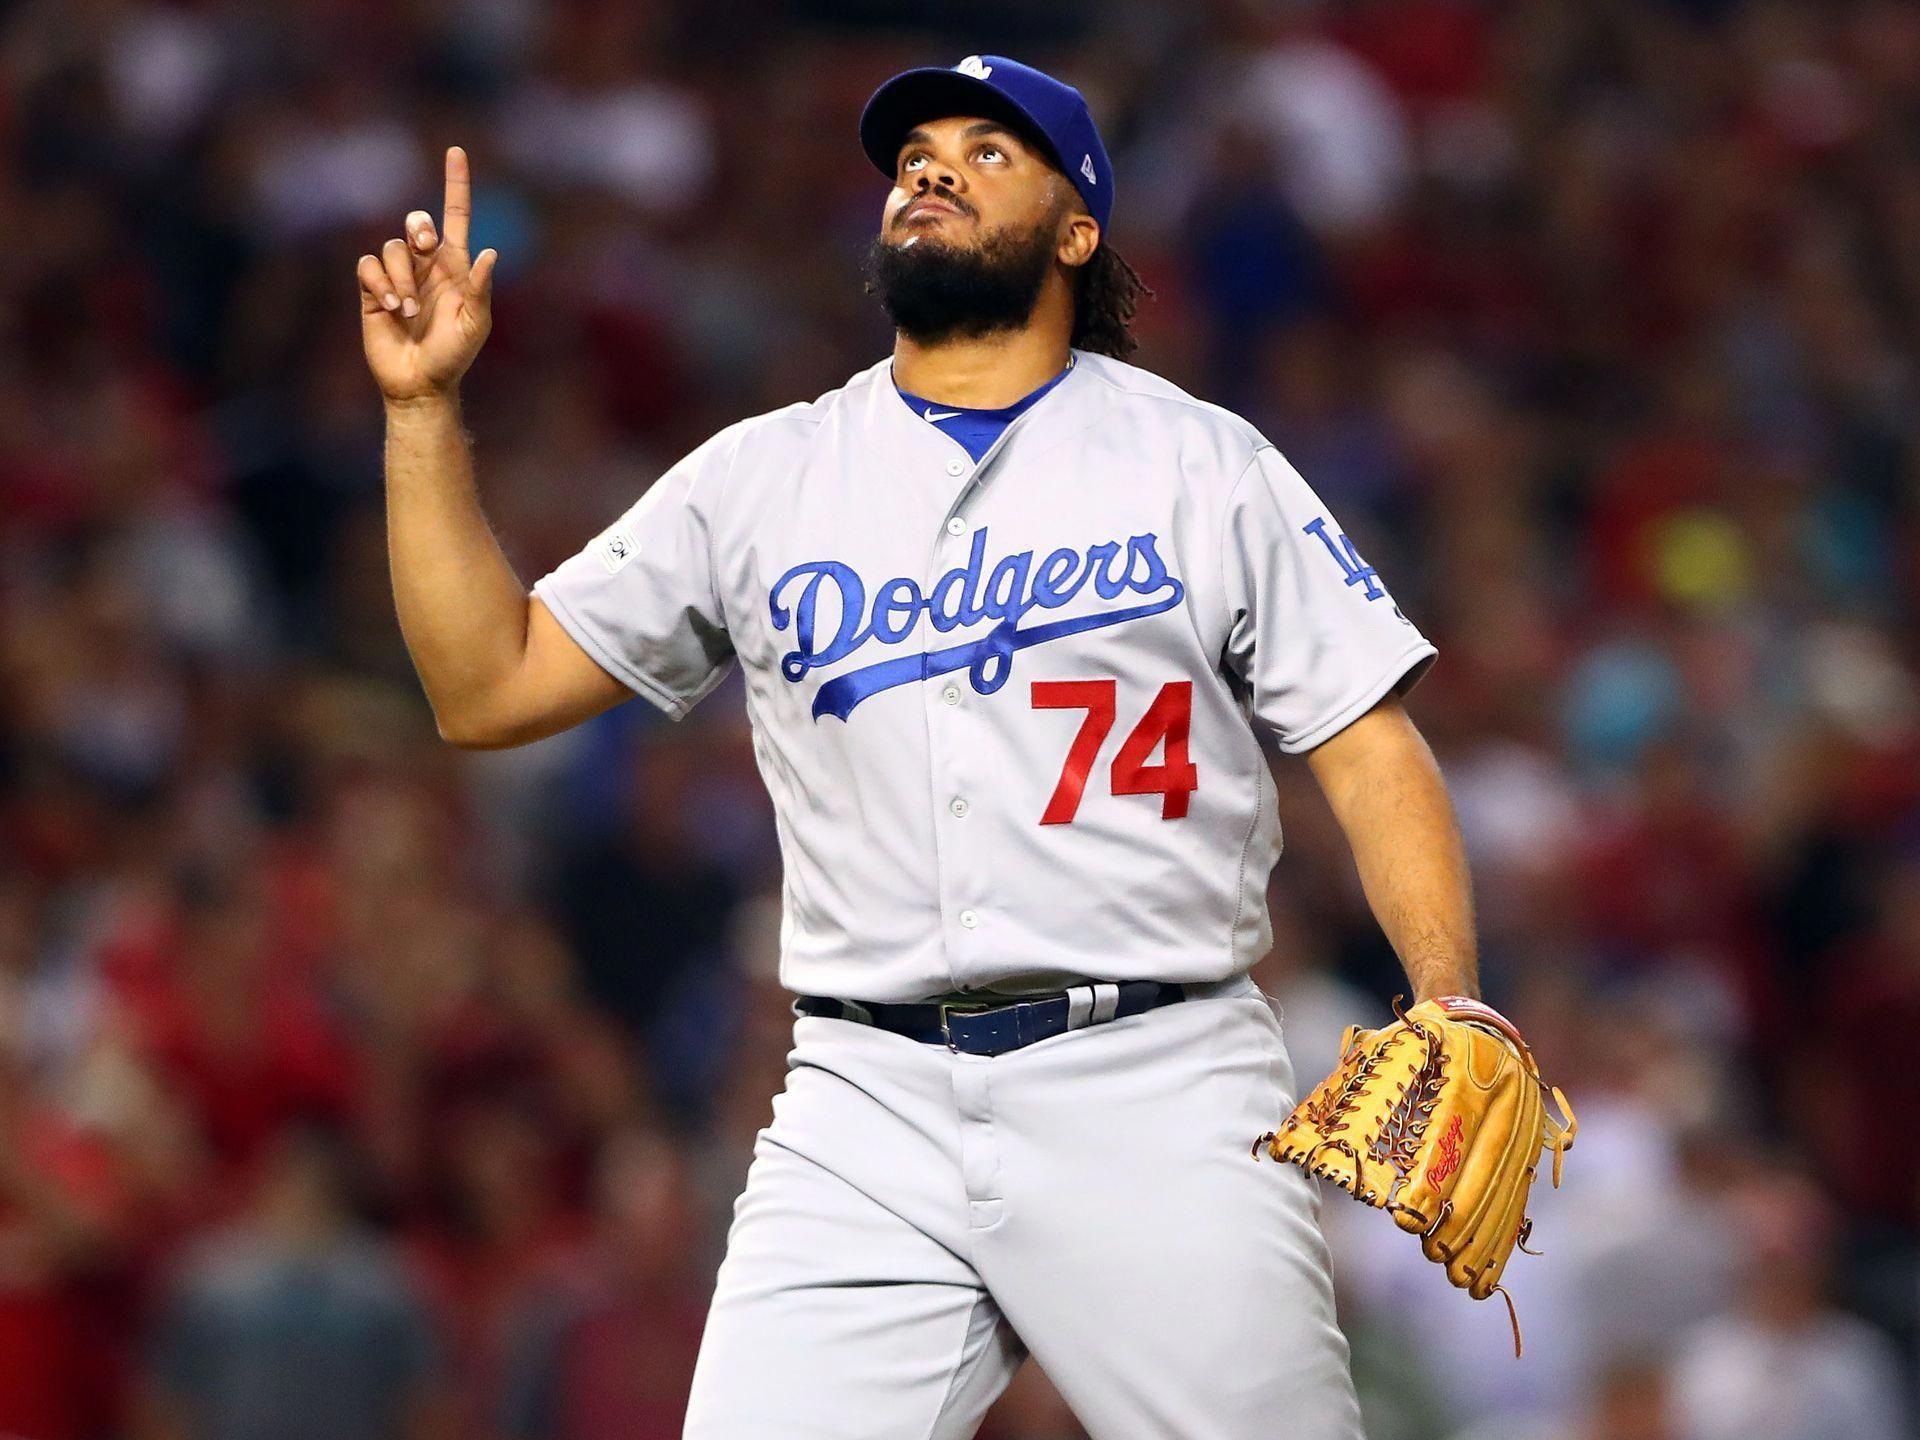 NLDS Game 3 Dodgers at Diamondbacks Dodgers closer